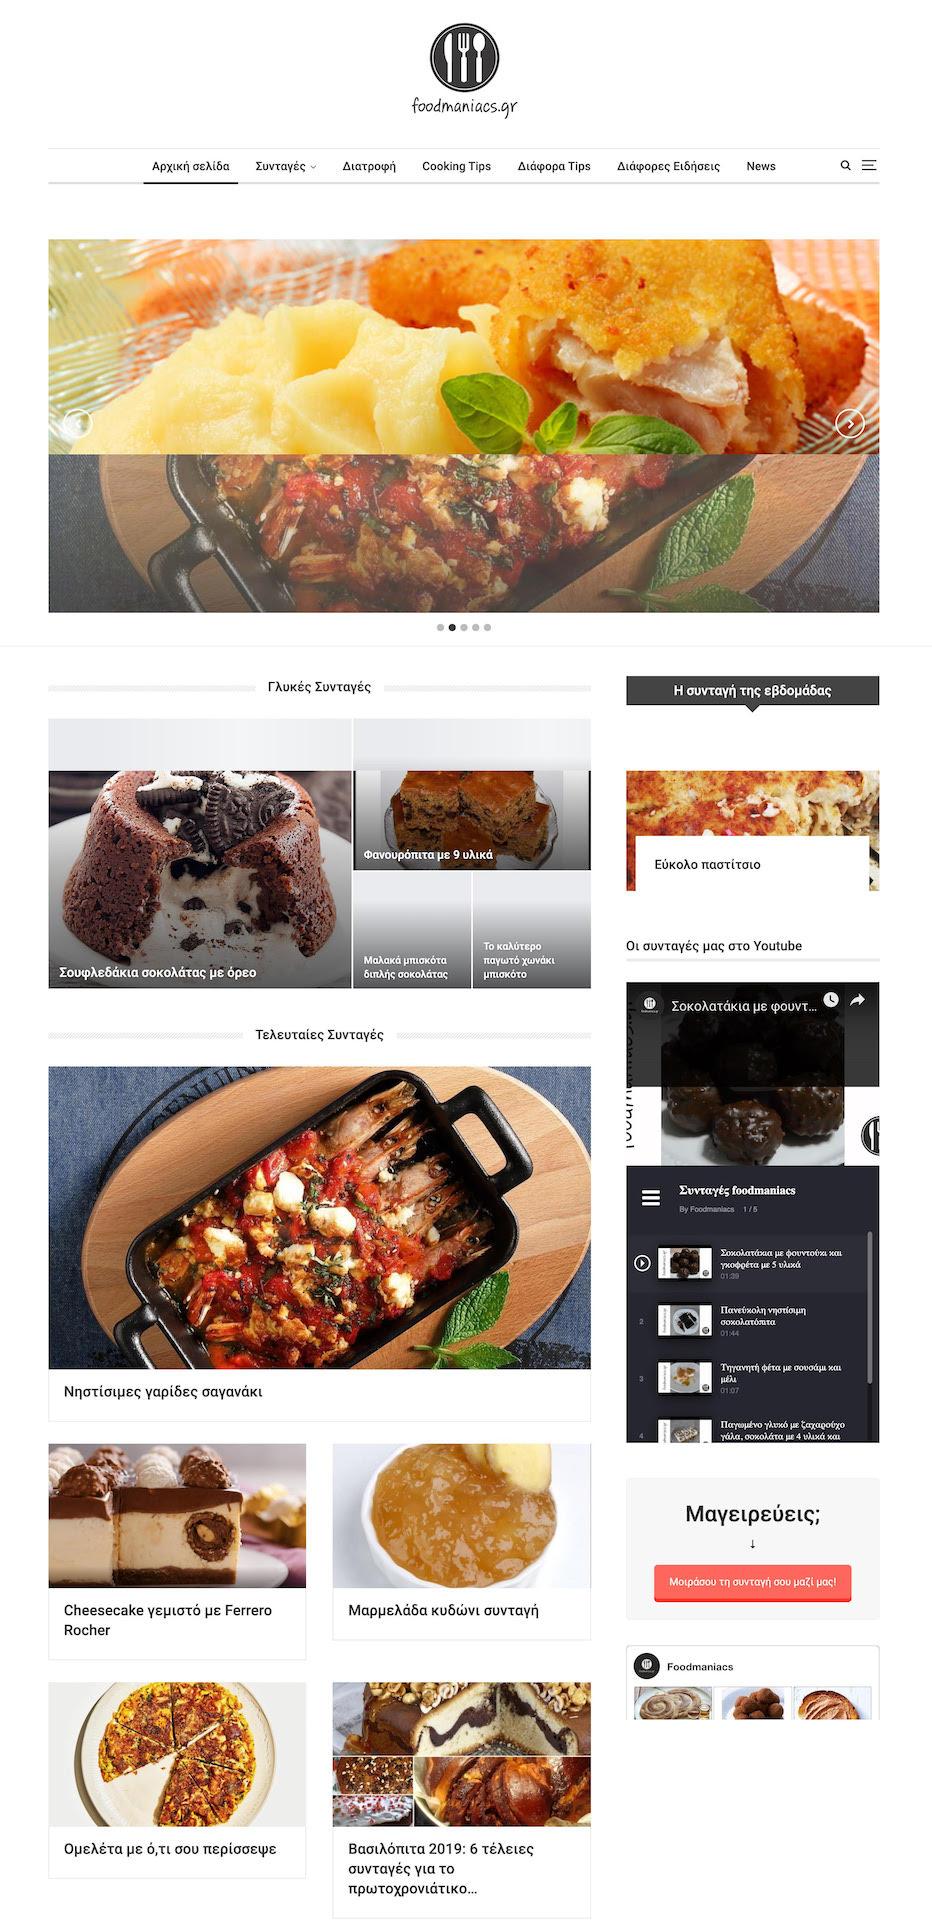 foodmaniacs homepage